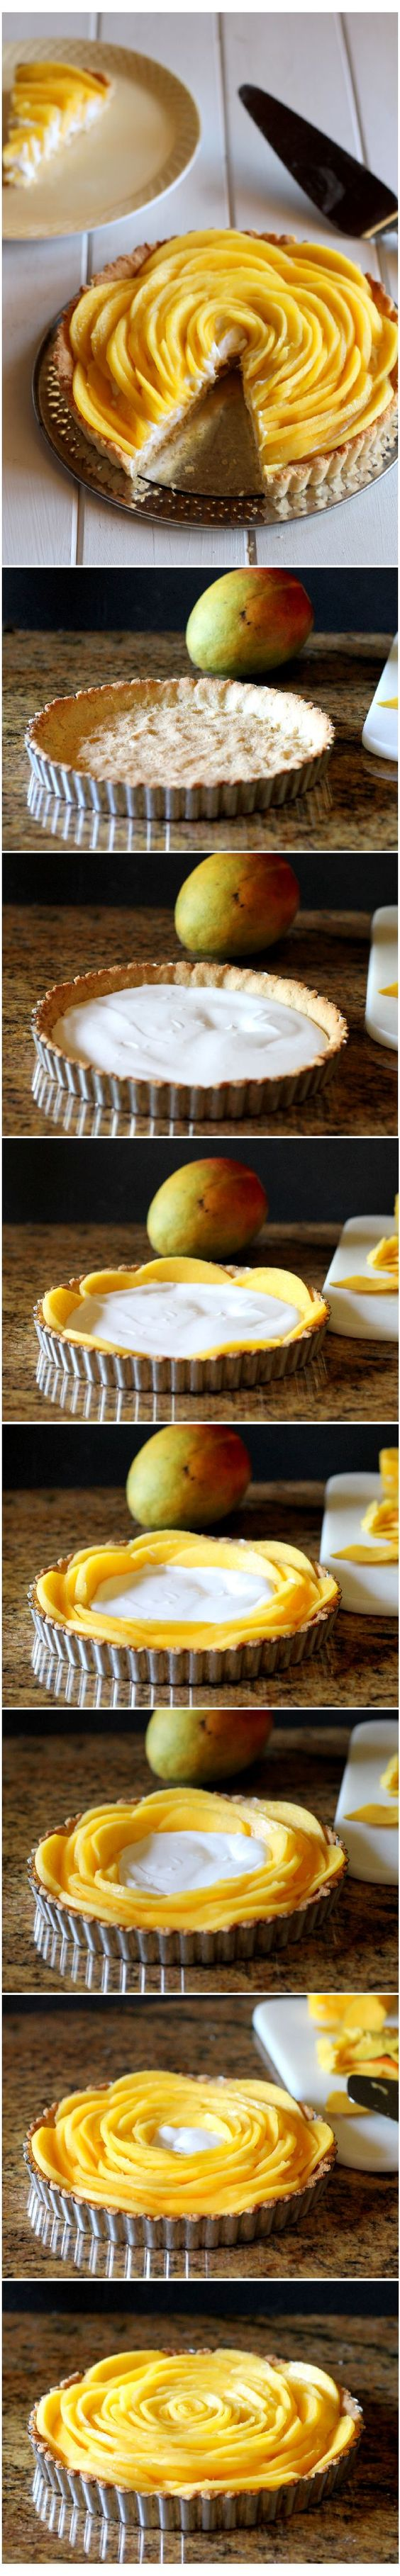 Mango Tart (Gluten Free, Paleo, Vegan, Refined Sugar Free) | from Bakerita.com #recipe #paleo #glutenfree: